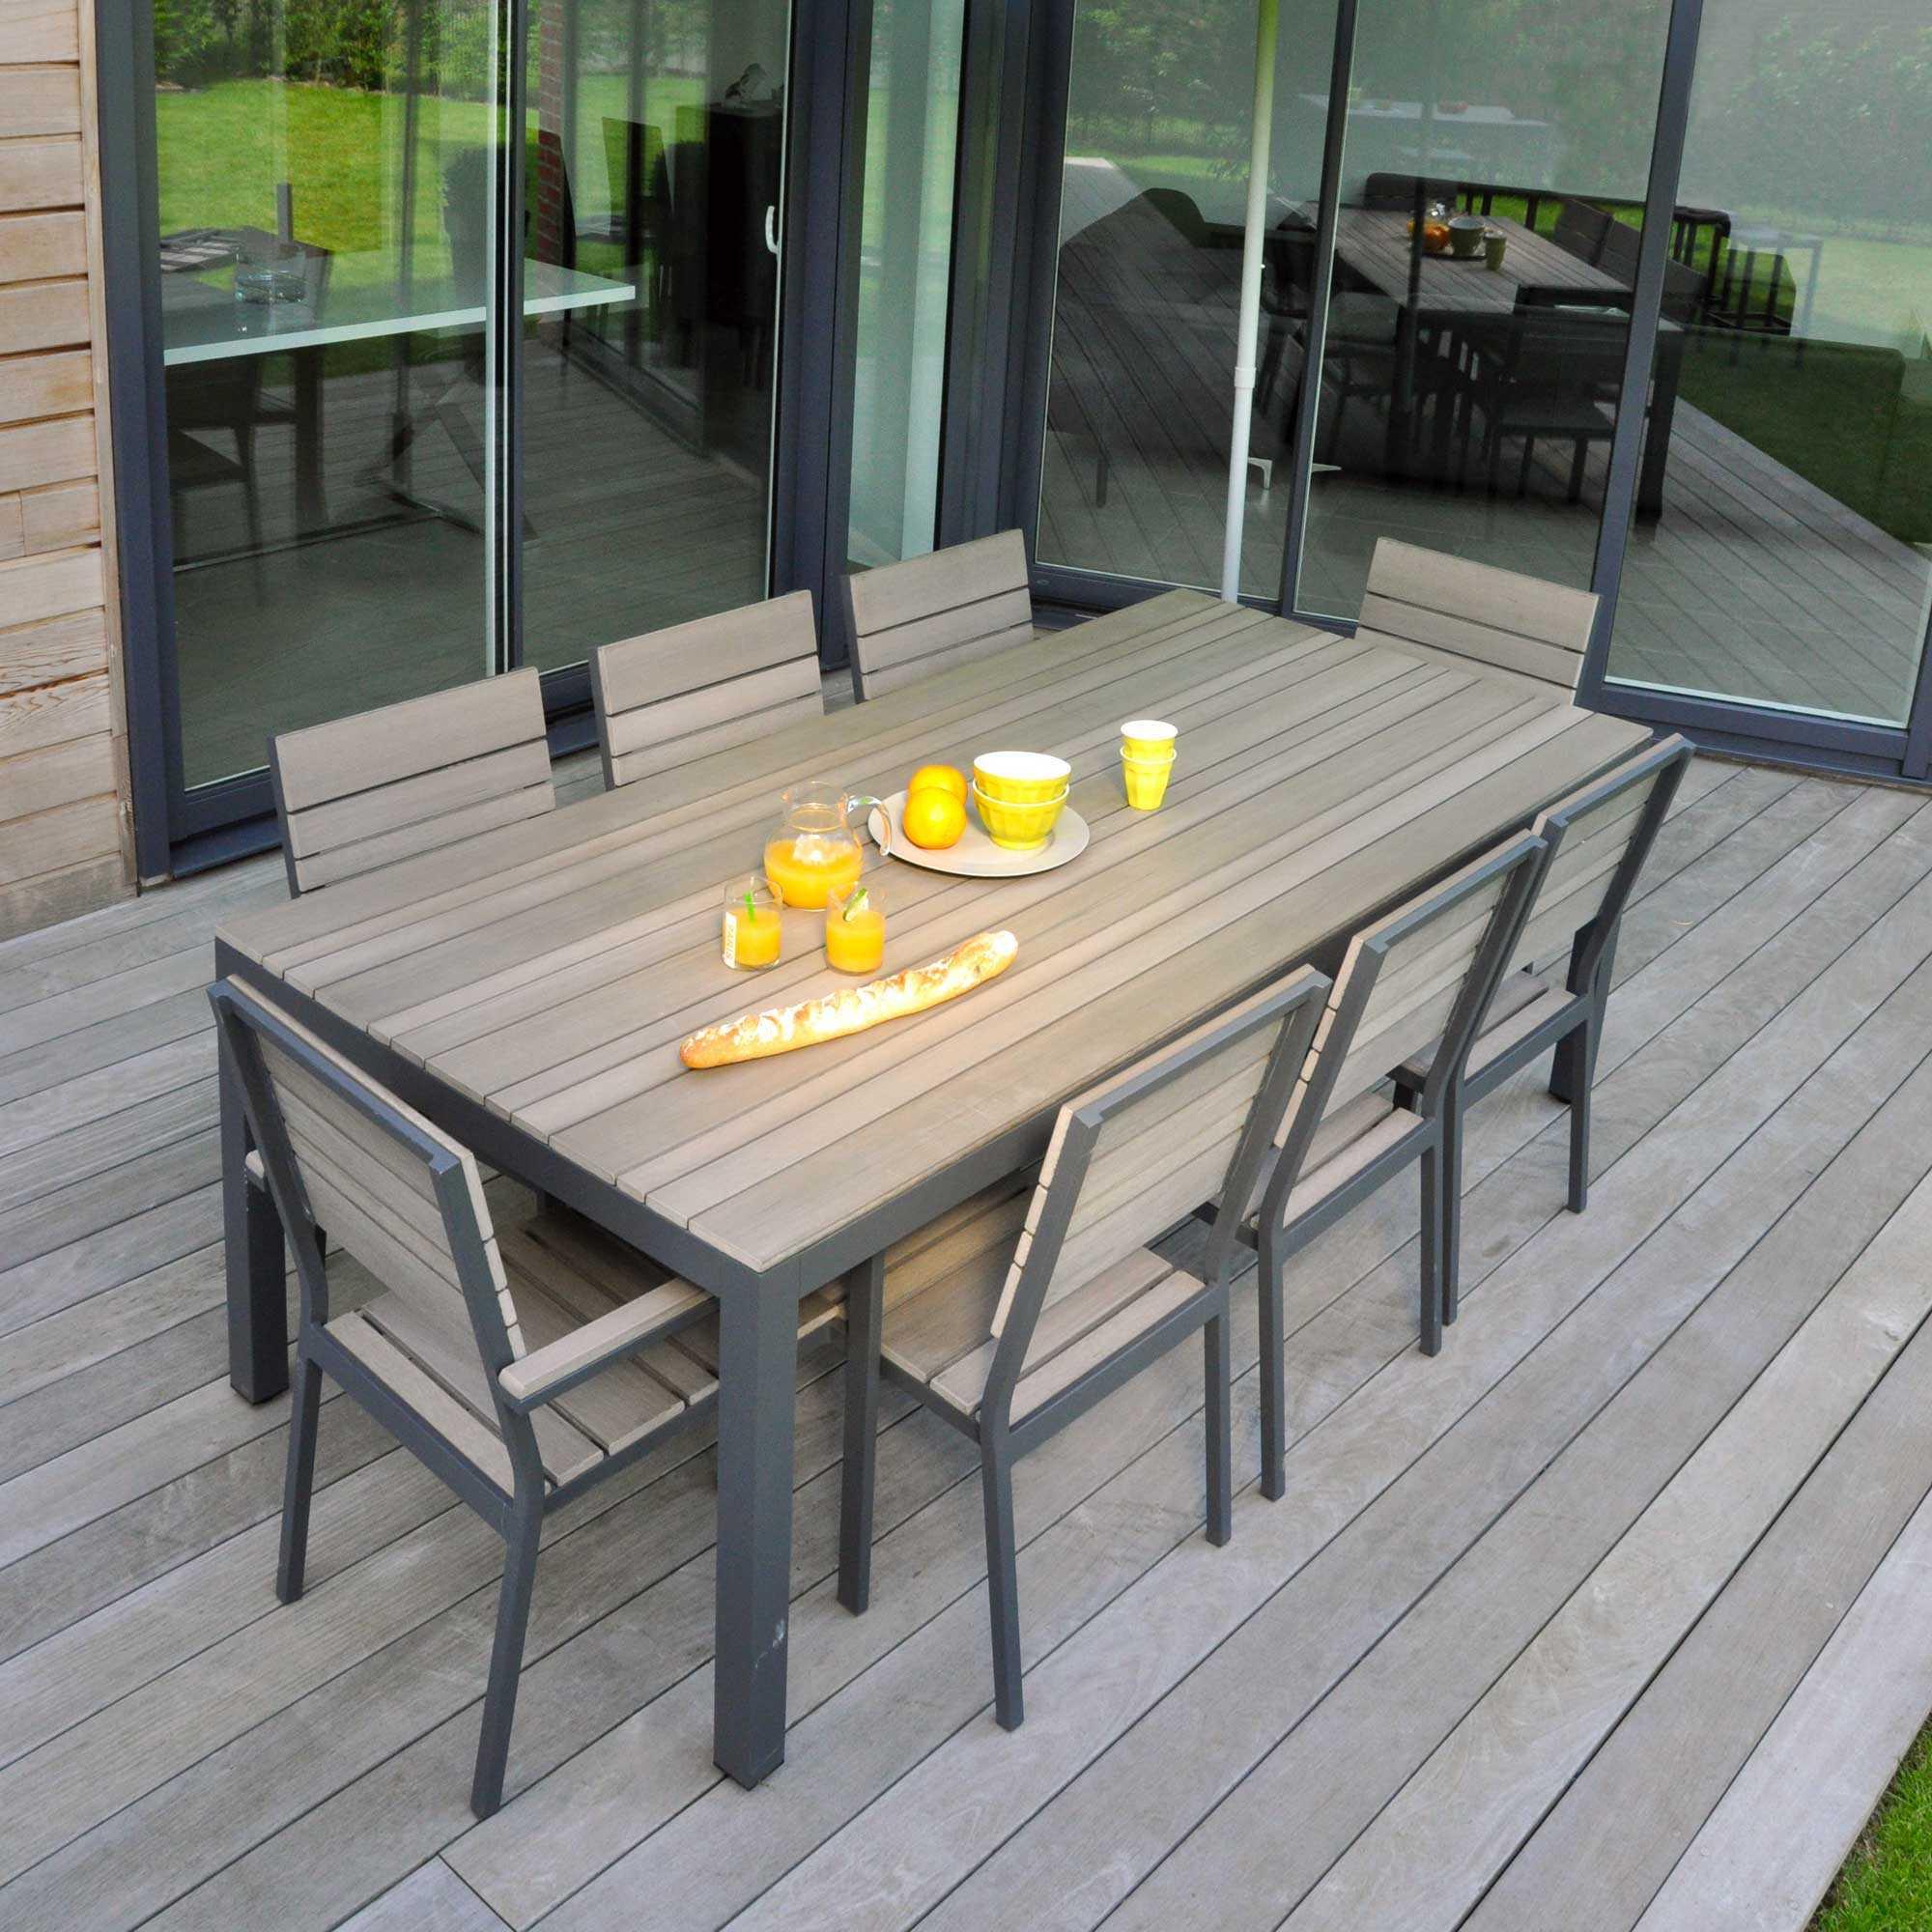 table de jardin moderne galerie avec table de jardin pas cher magasin sentrakor licieux mobilier de jardin super salon de jardin super des photos salon de jardin resine super